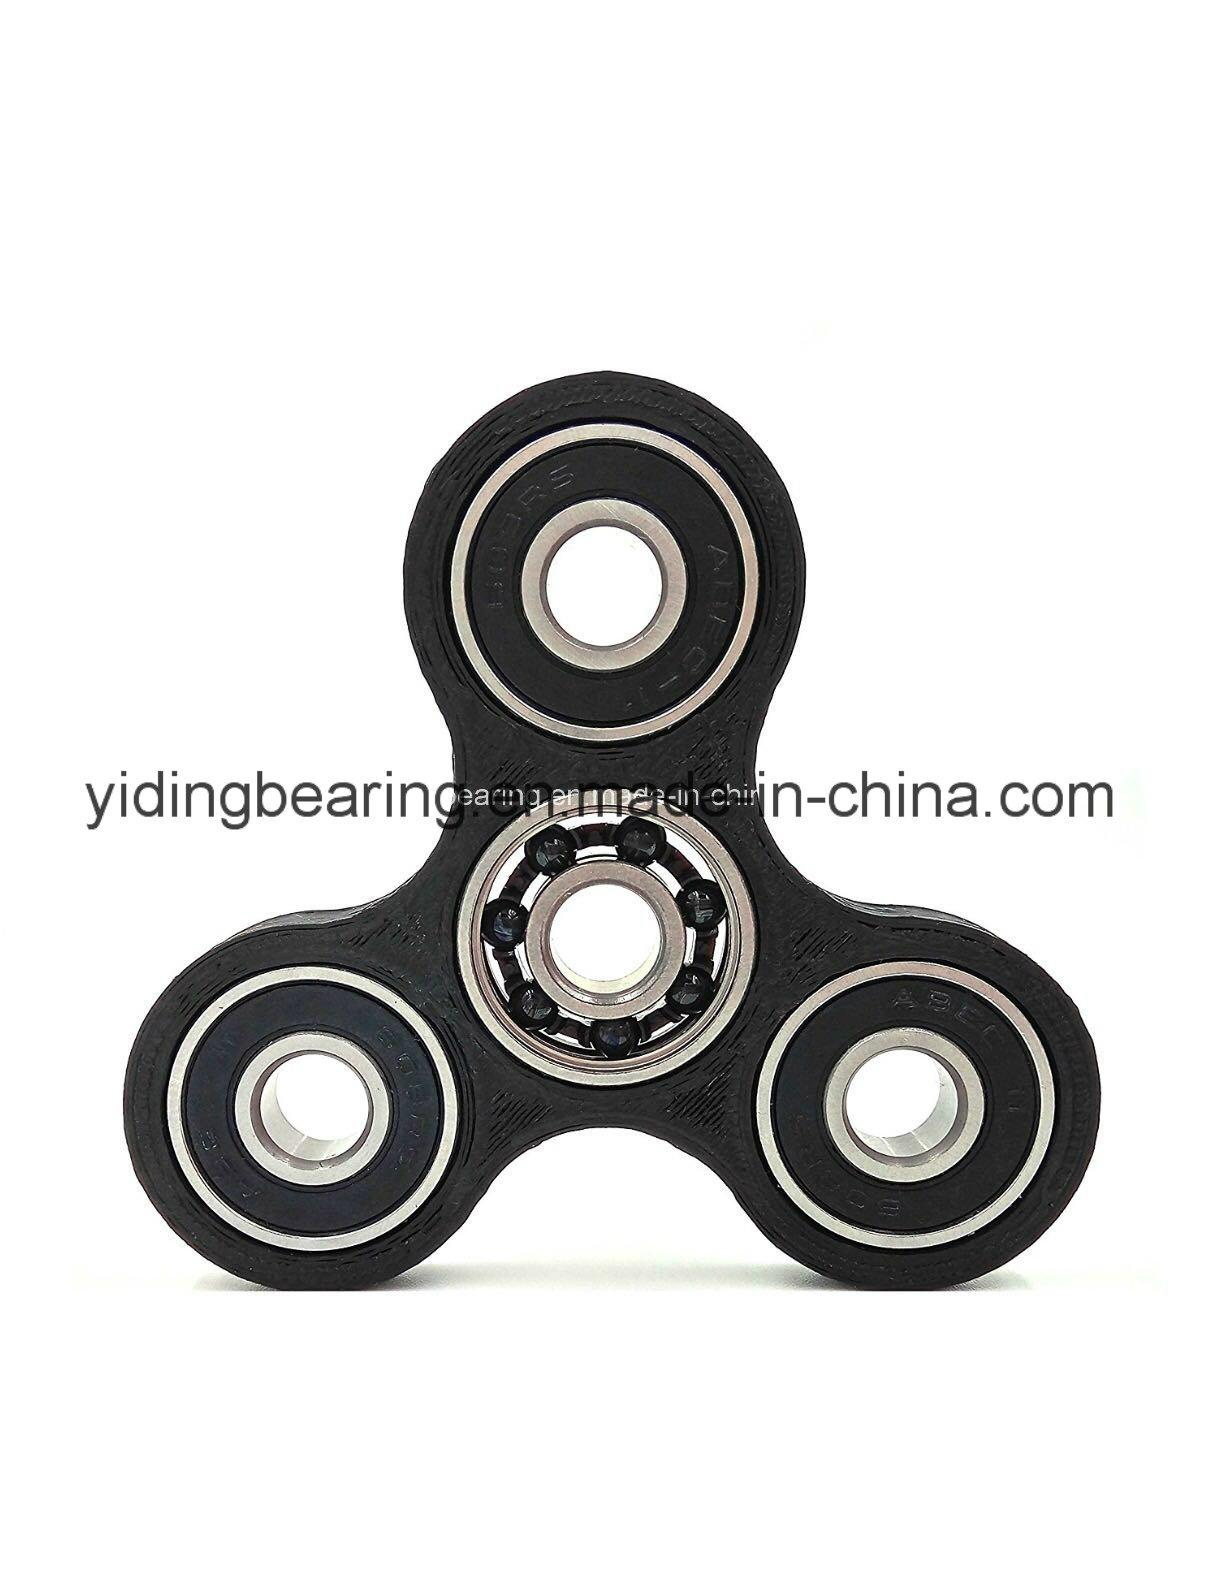 Hand Spinner ABS Plastic Spinner Fidget with Toy Spinner Bearings 608